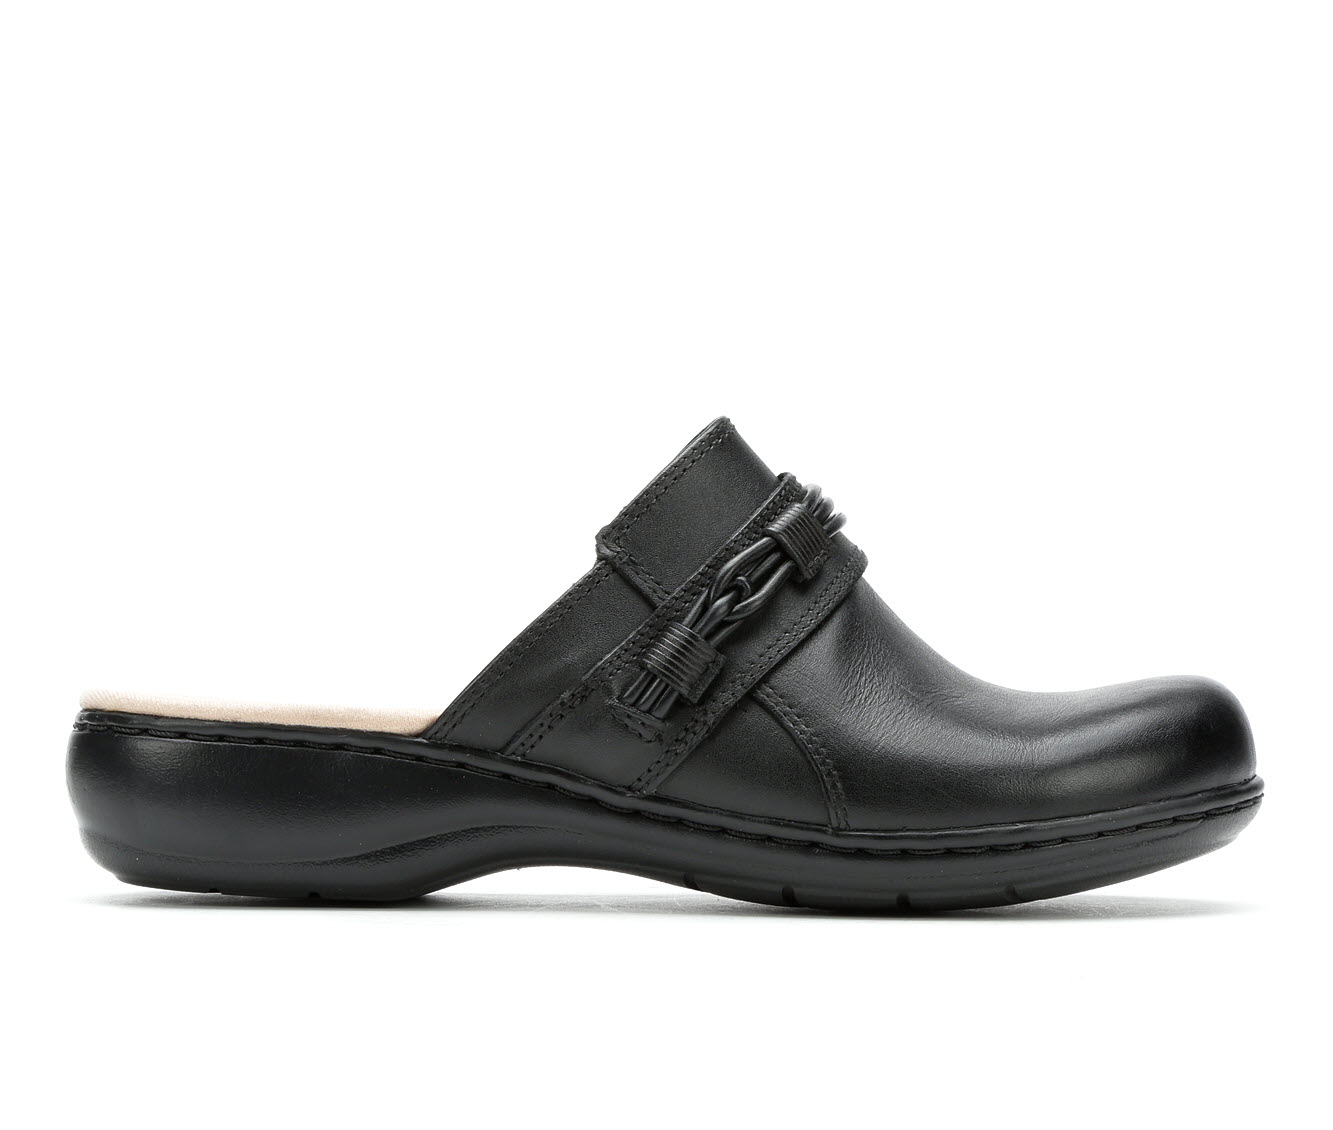 Clarks Leisa Clover Women's Shoe (Black Leather)